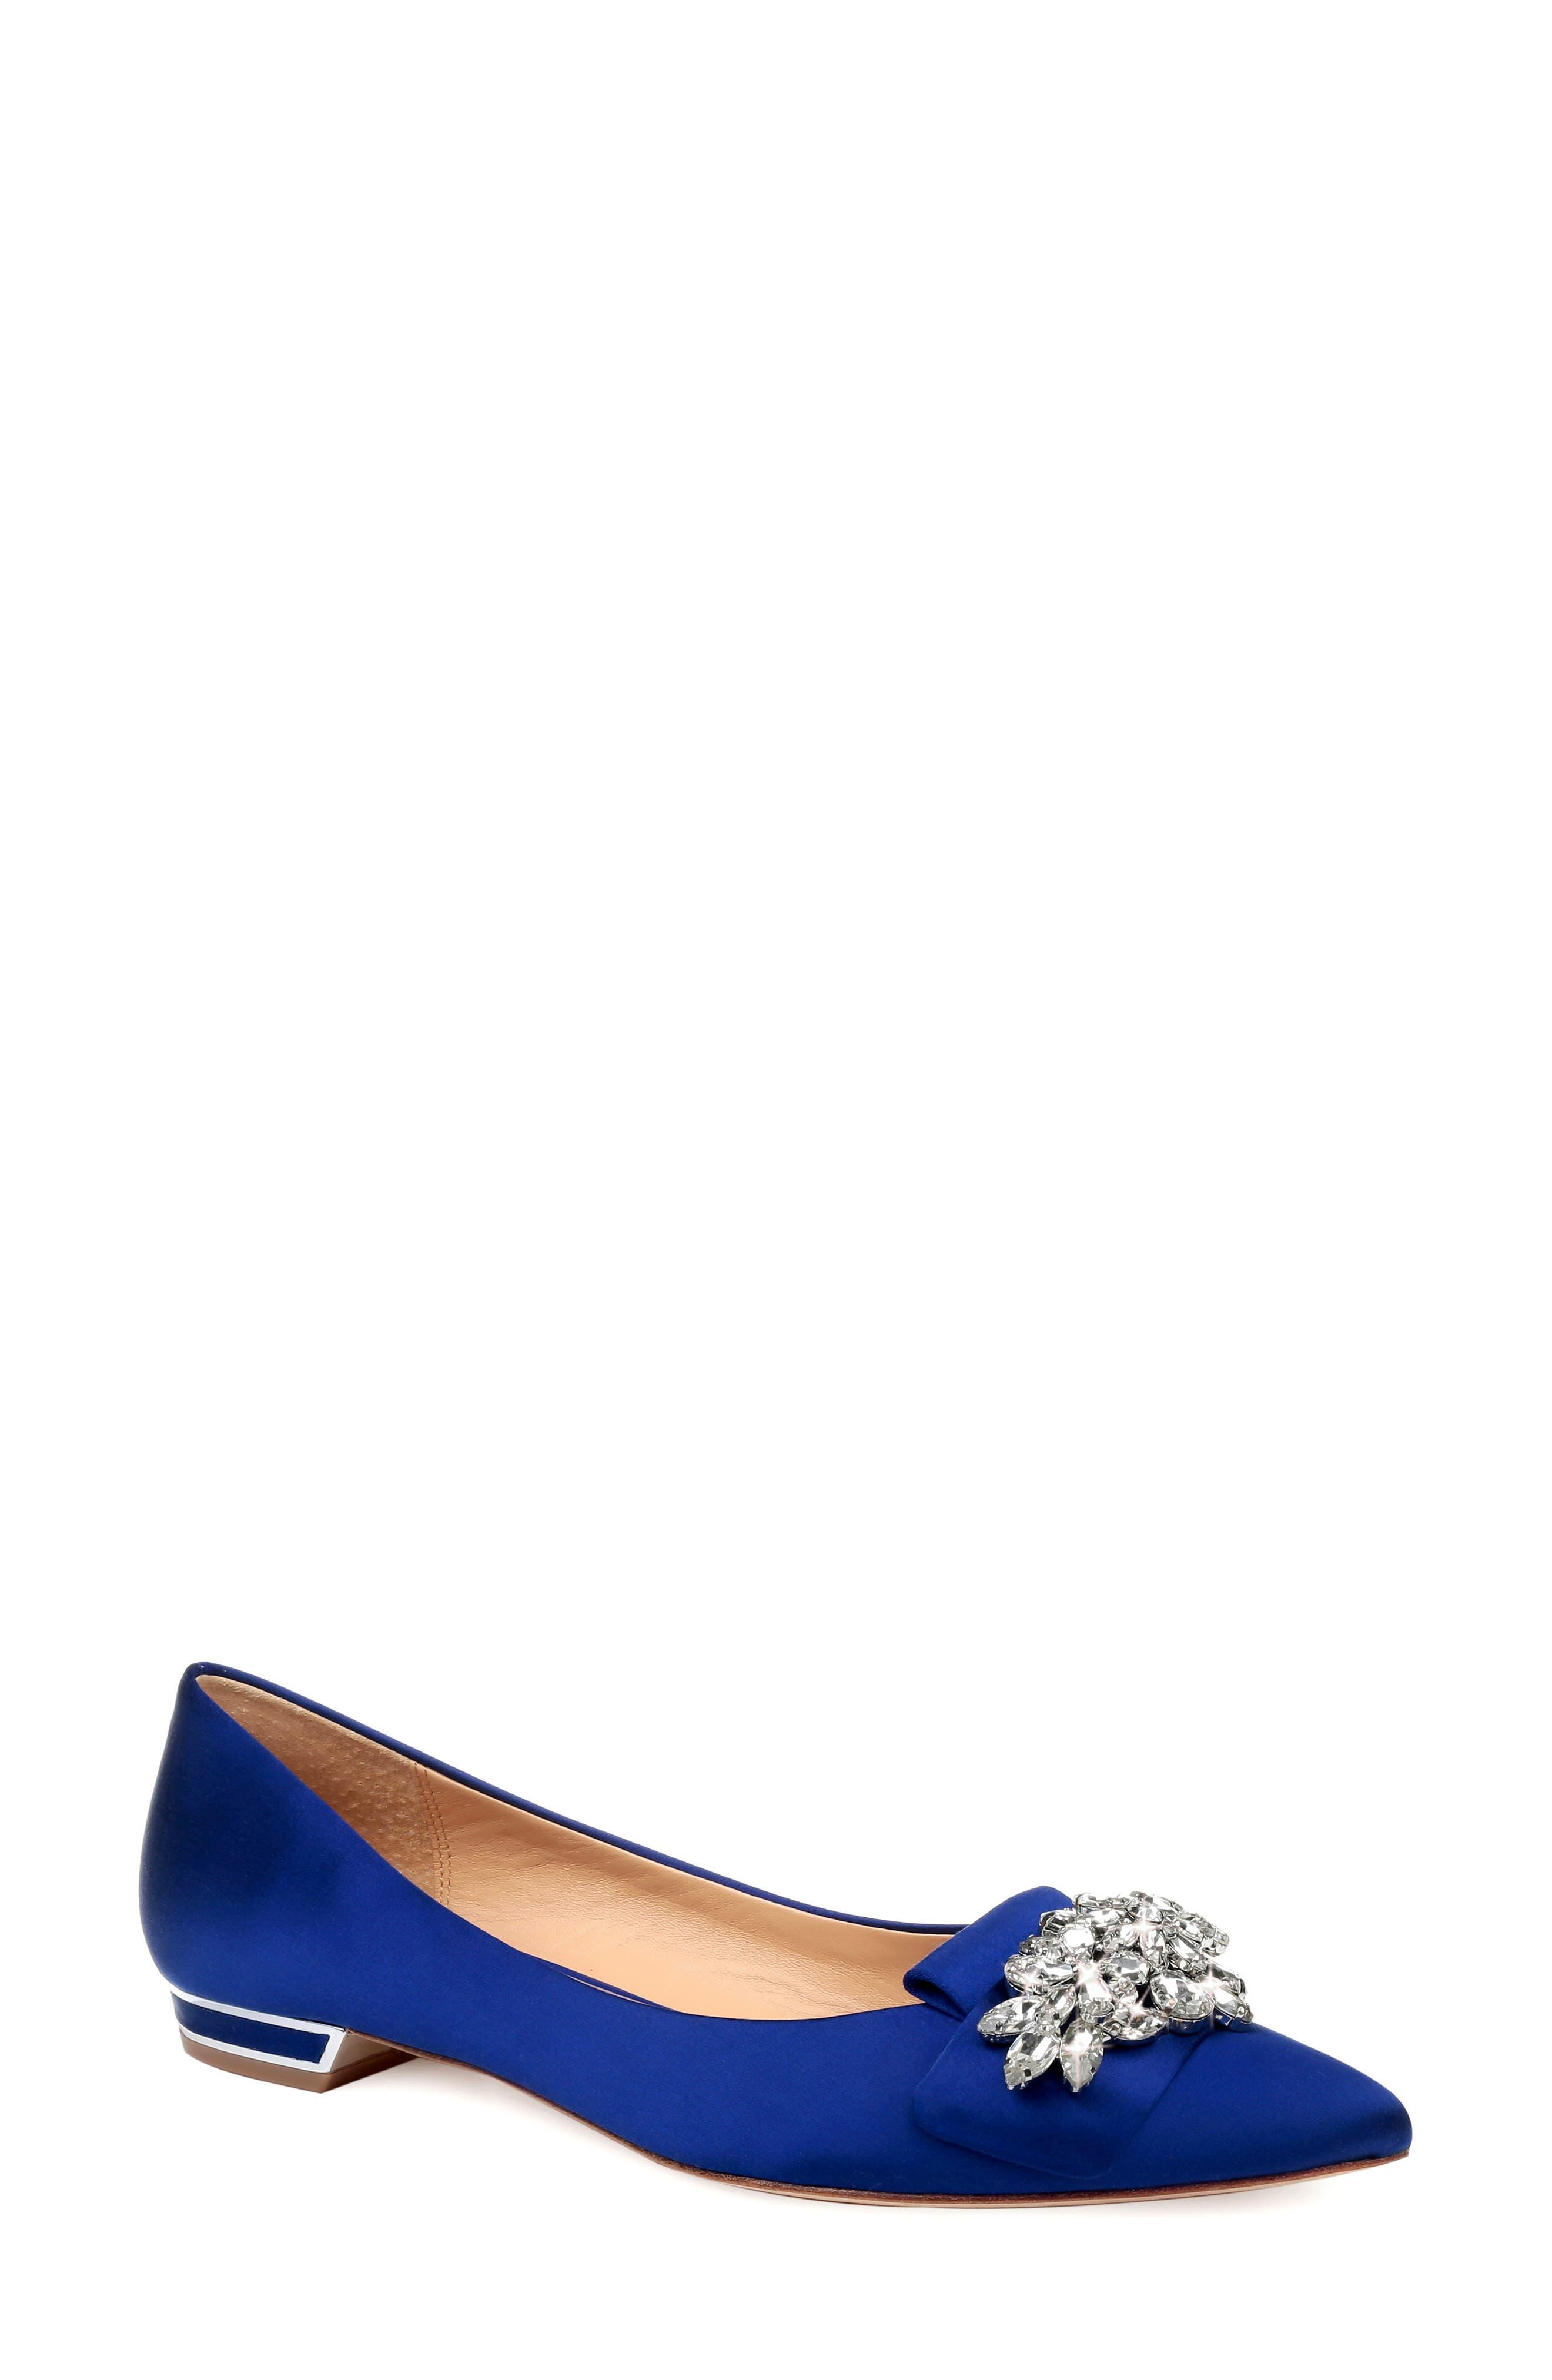 Badgley Mischka Valeria Crystal Embellished Flat